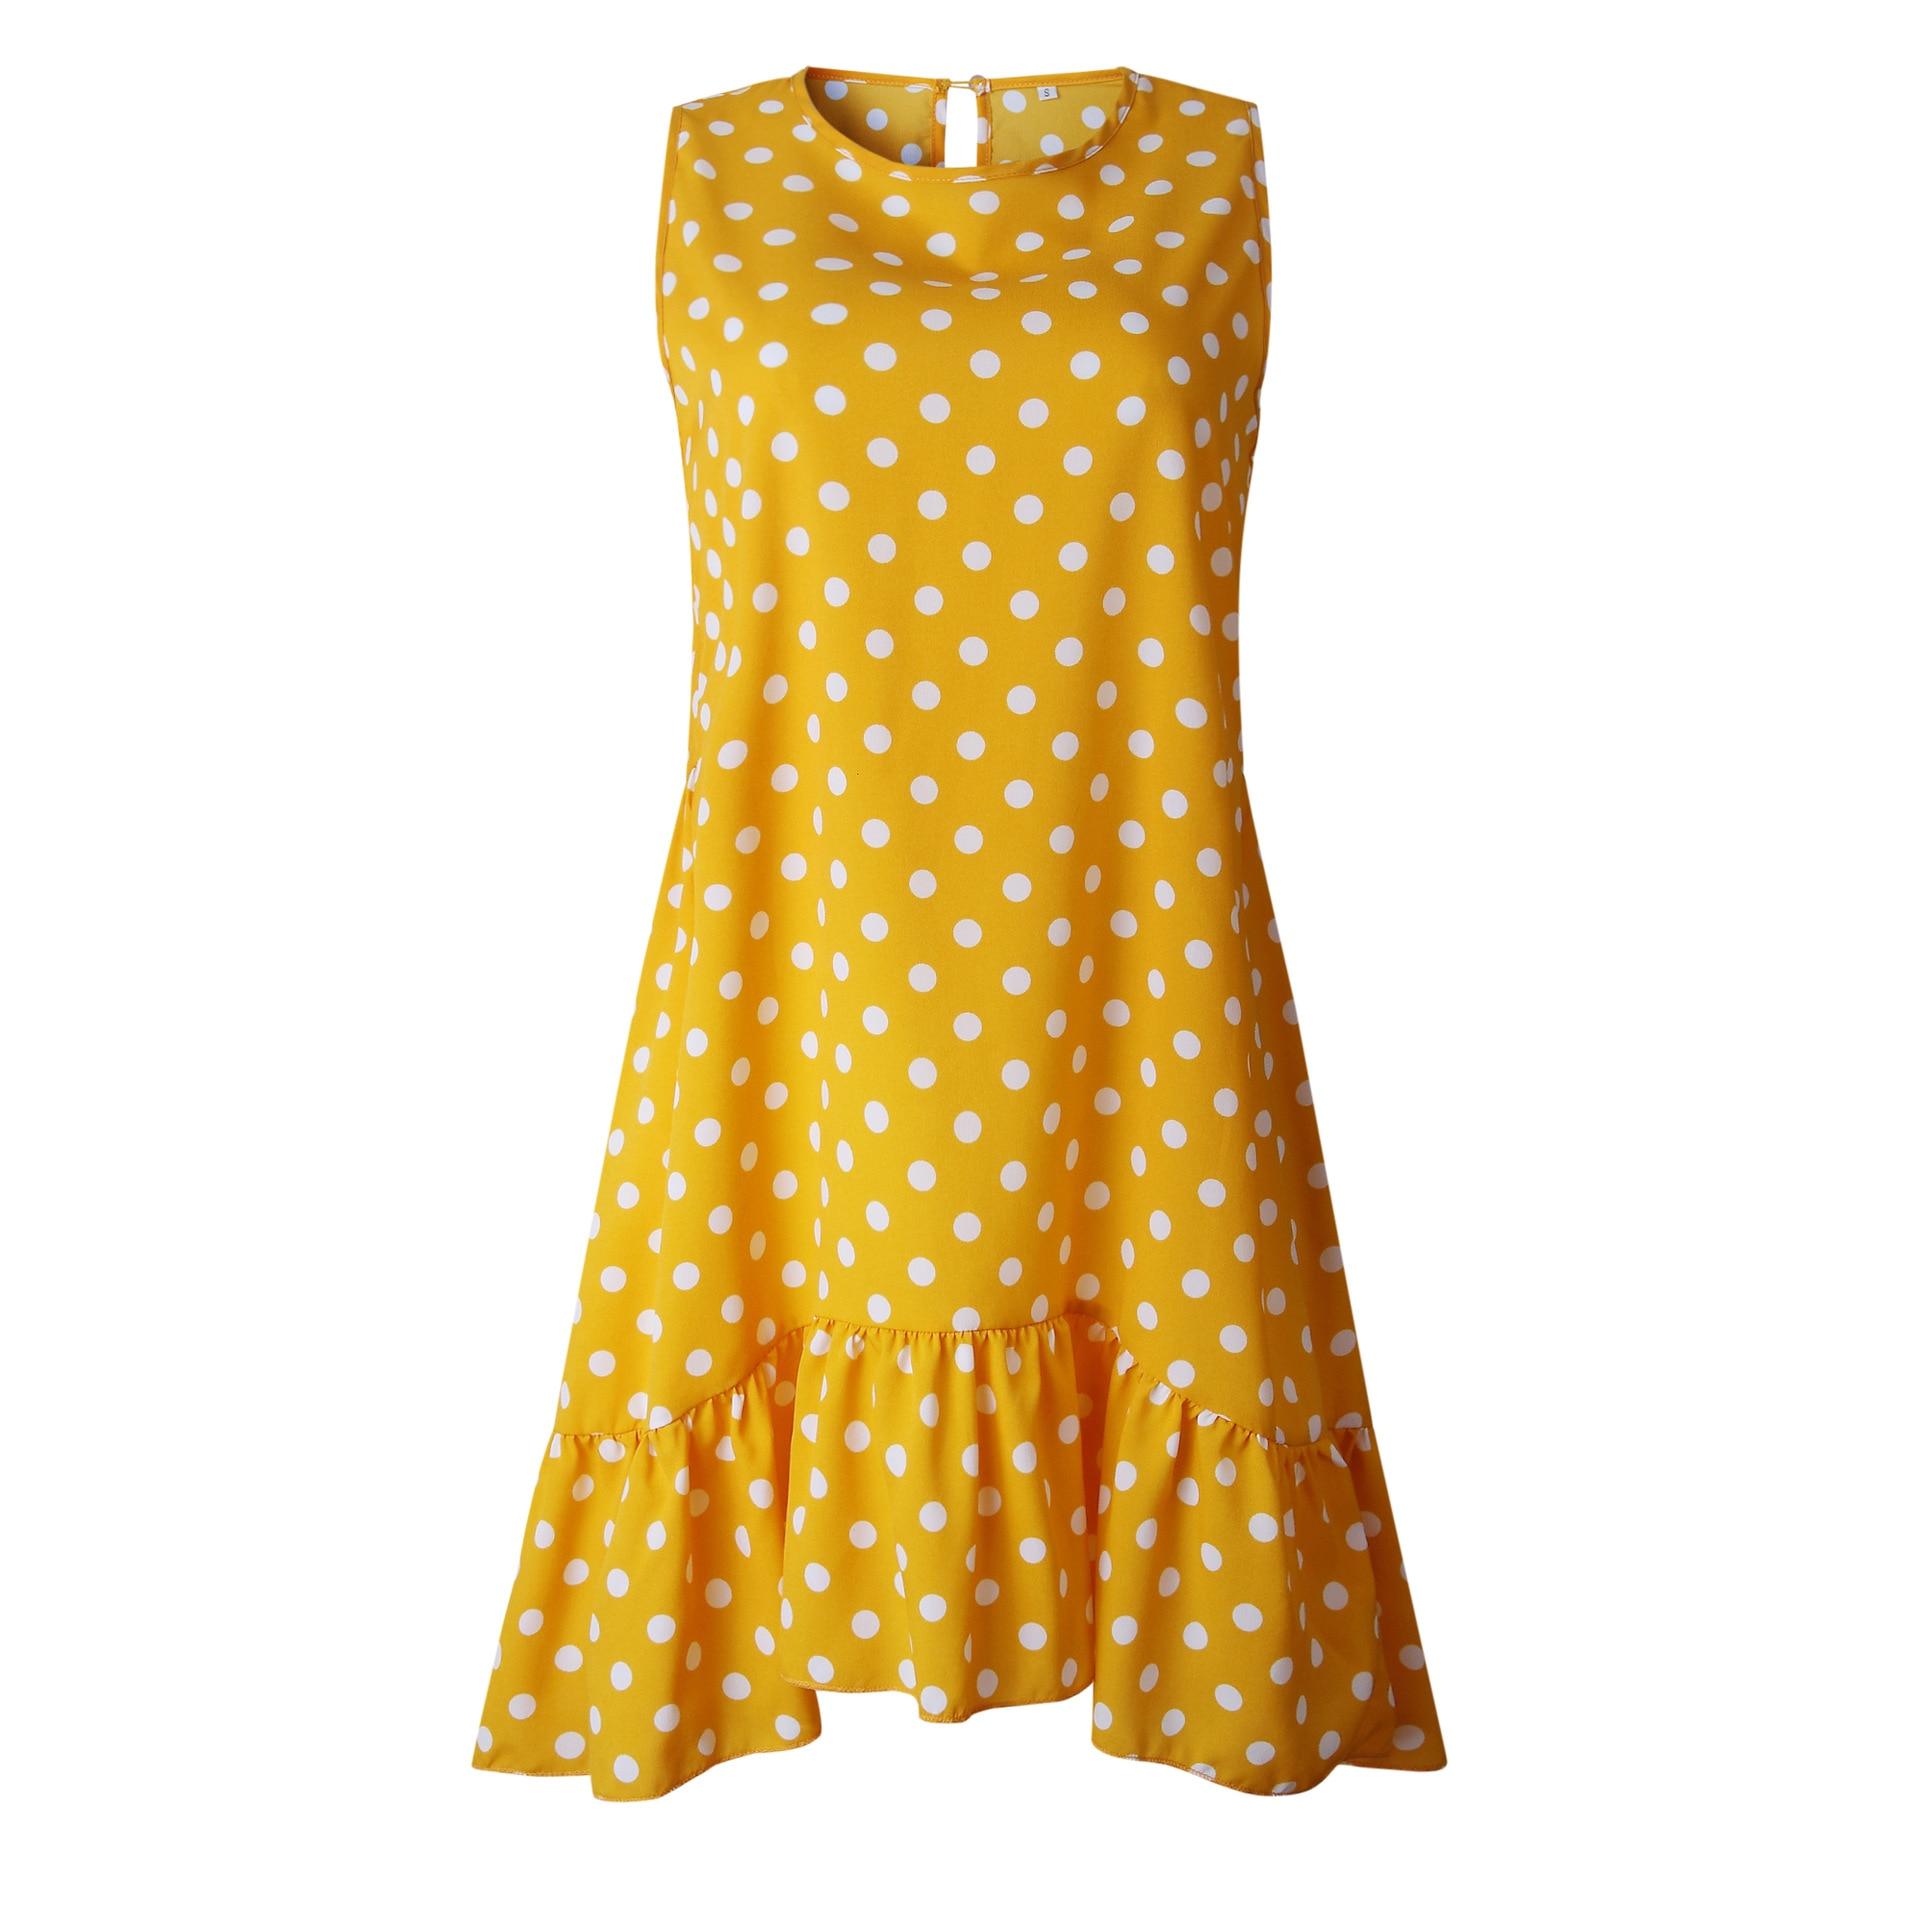 Wave Point Dress Ruffle Women 2019 Spring Summer Street Sexy Casual Slim Thin Beach Party O Neck Mini Polka Dot Dress Vestidos